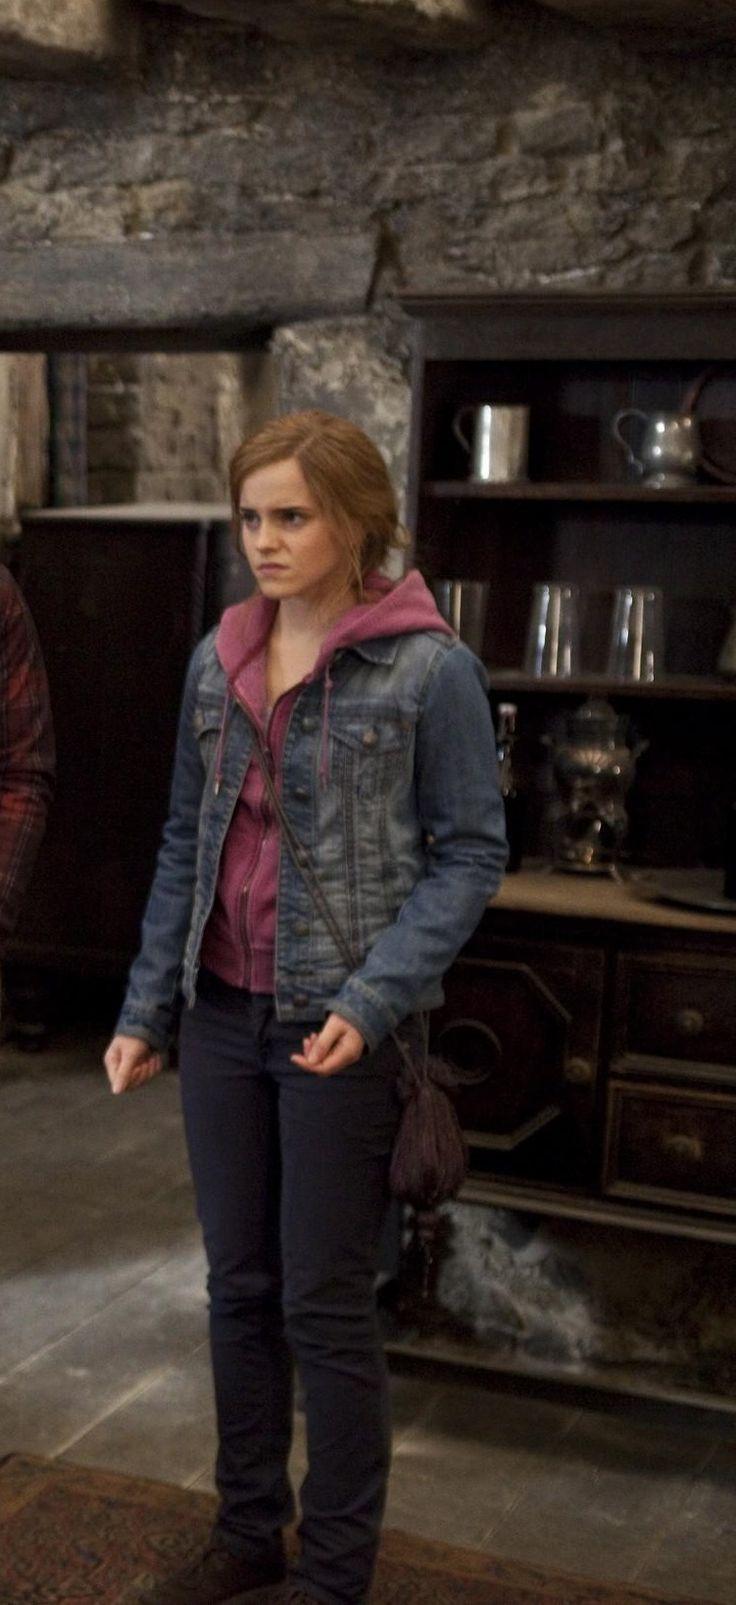 0d8b8de853603f2fd28905dd5f677d96 hermione cosplay hermione granger costume